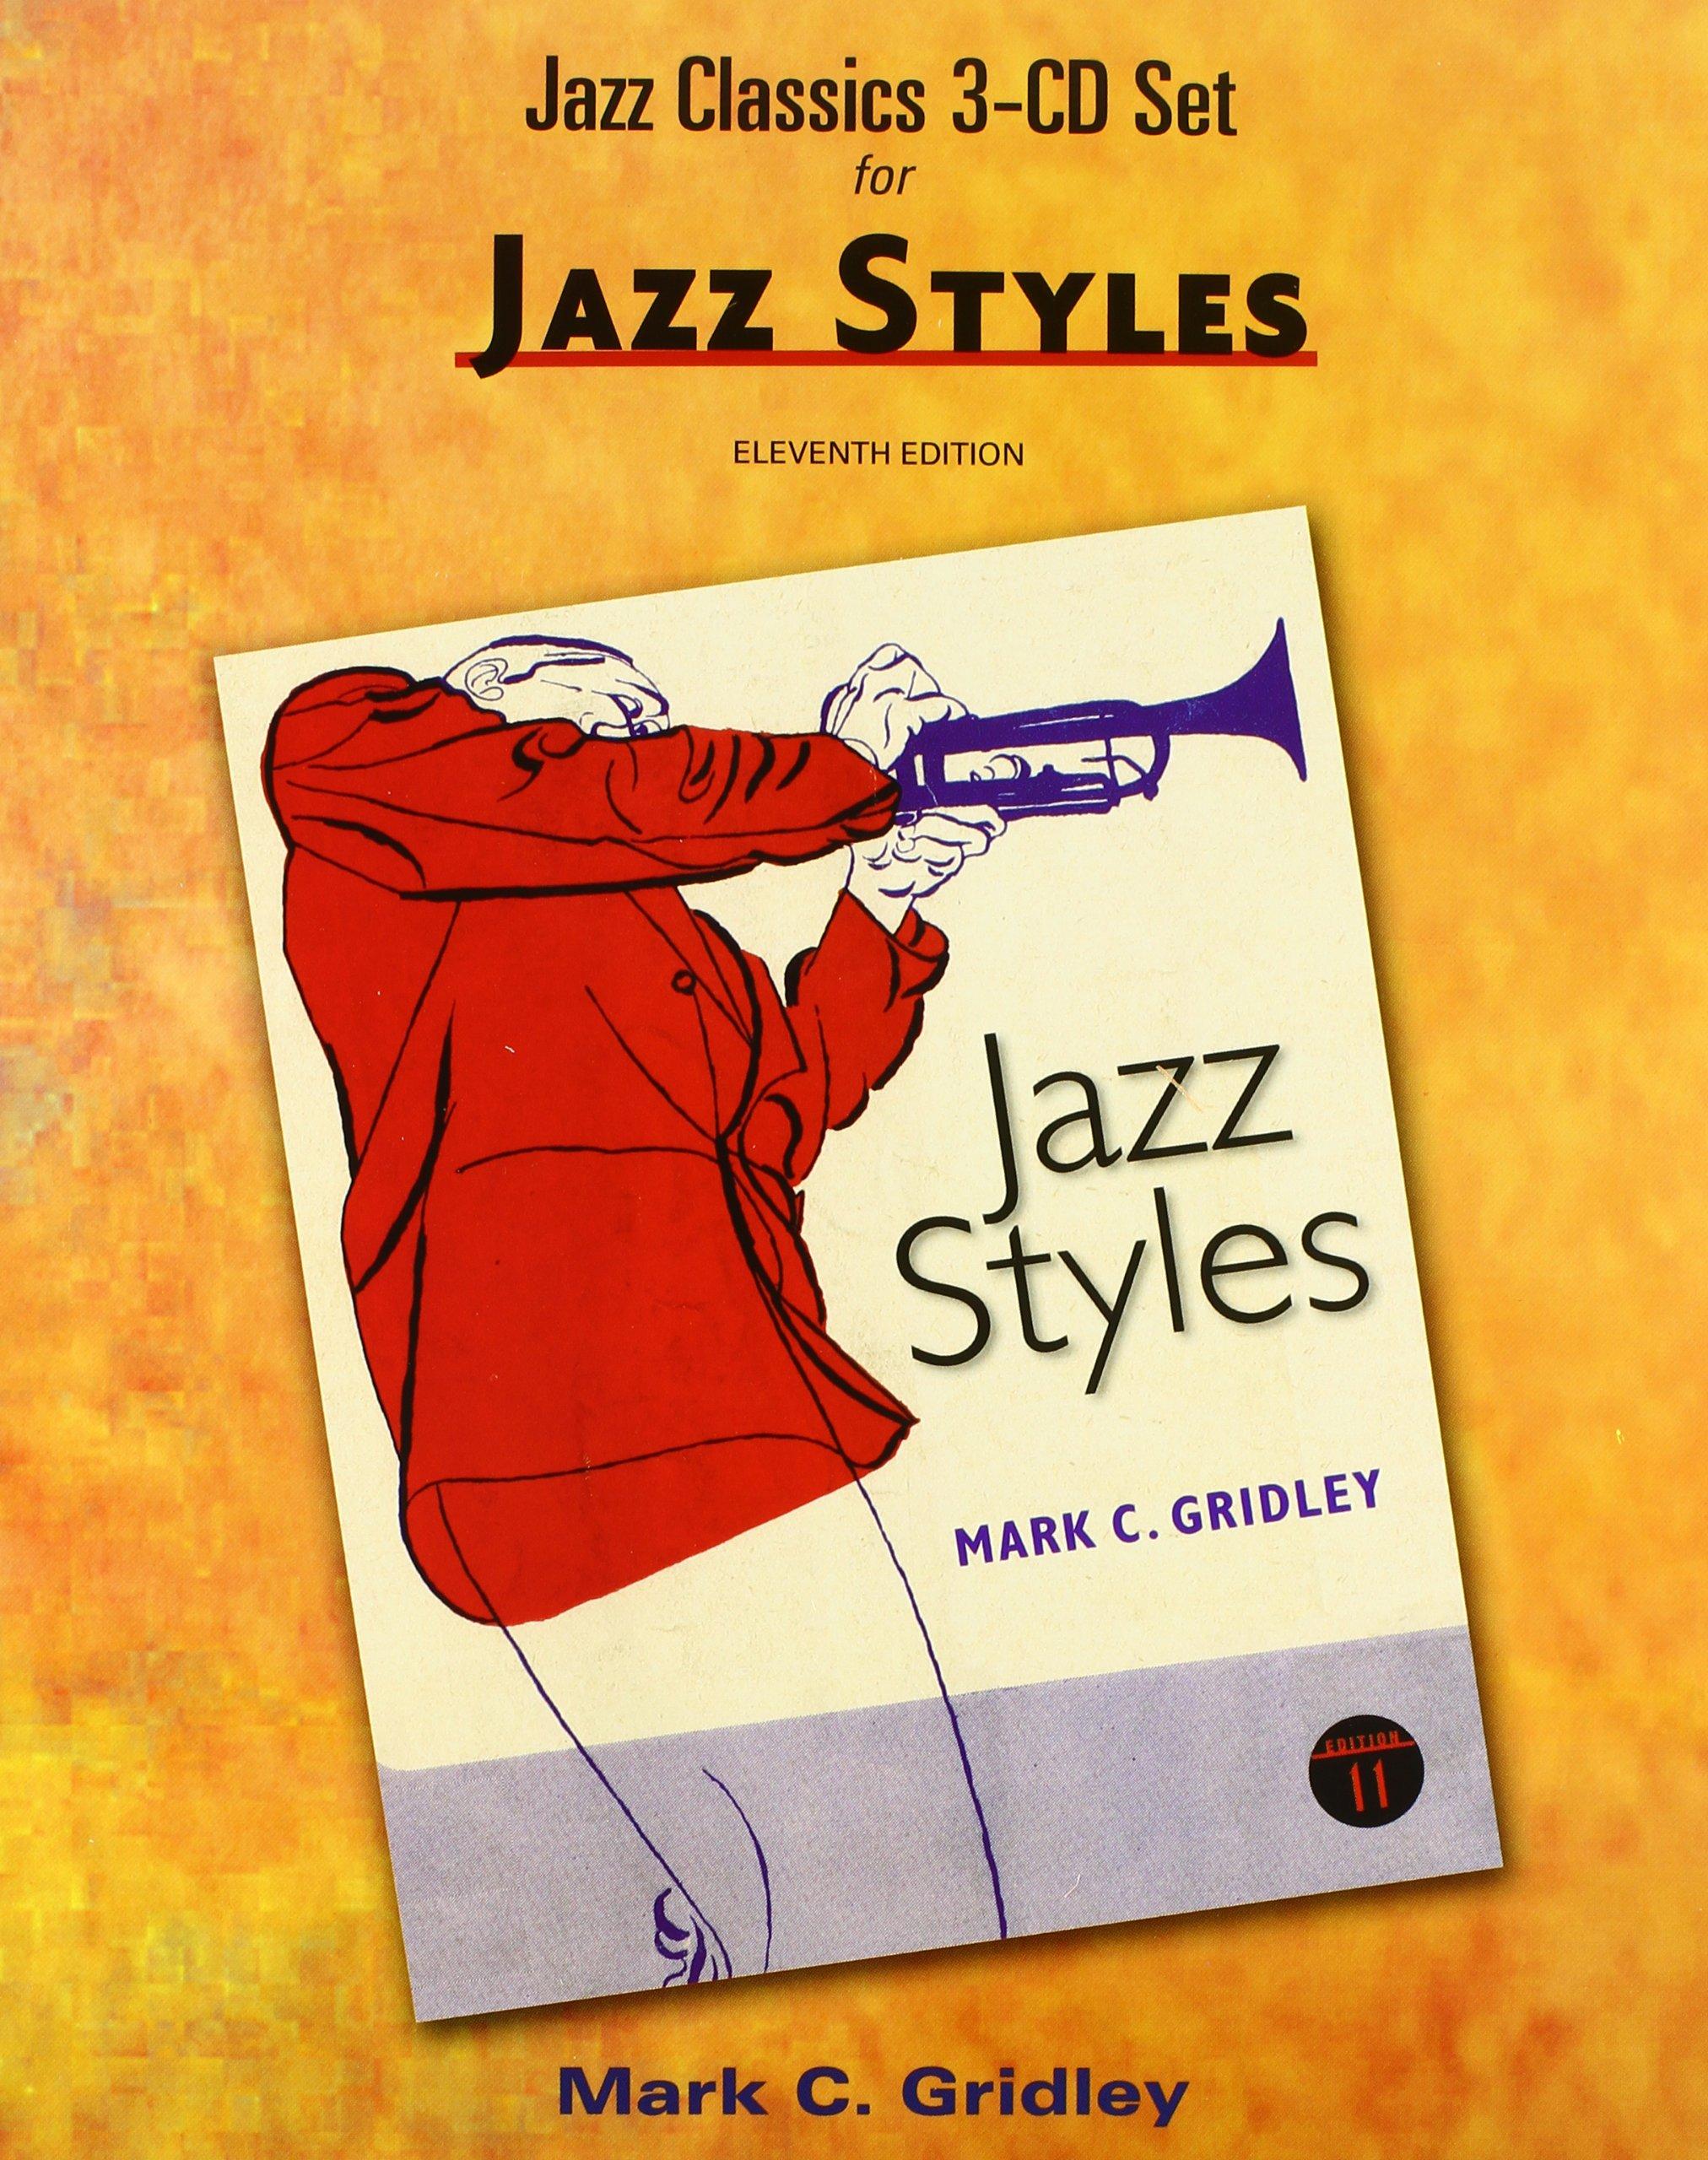 Jazz classics cd set 3 cds for jazz styles mark c gridley jazz classics cd set 3 cds for jazz styles mark c gridley 9780205036868 amazon books fandeluxe Images